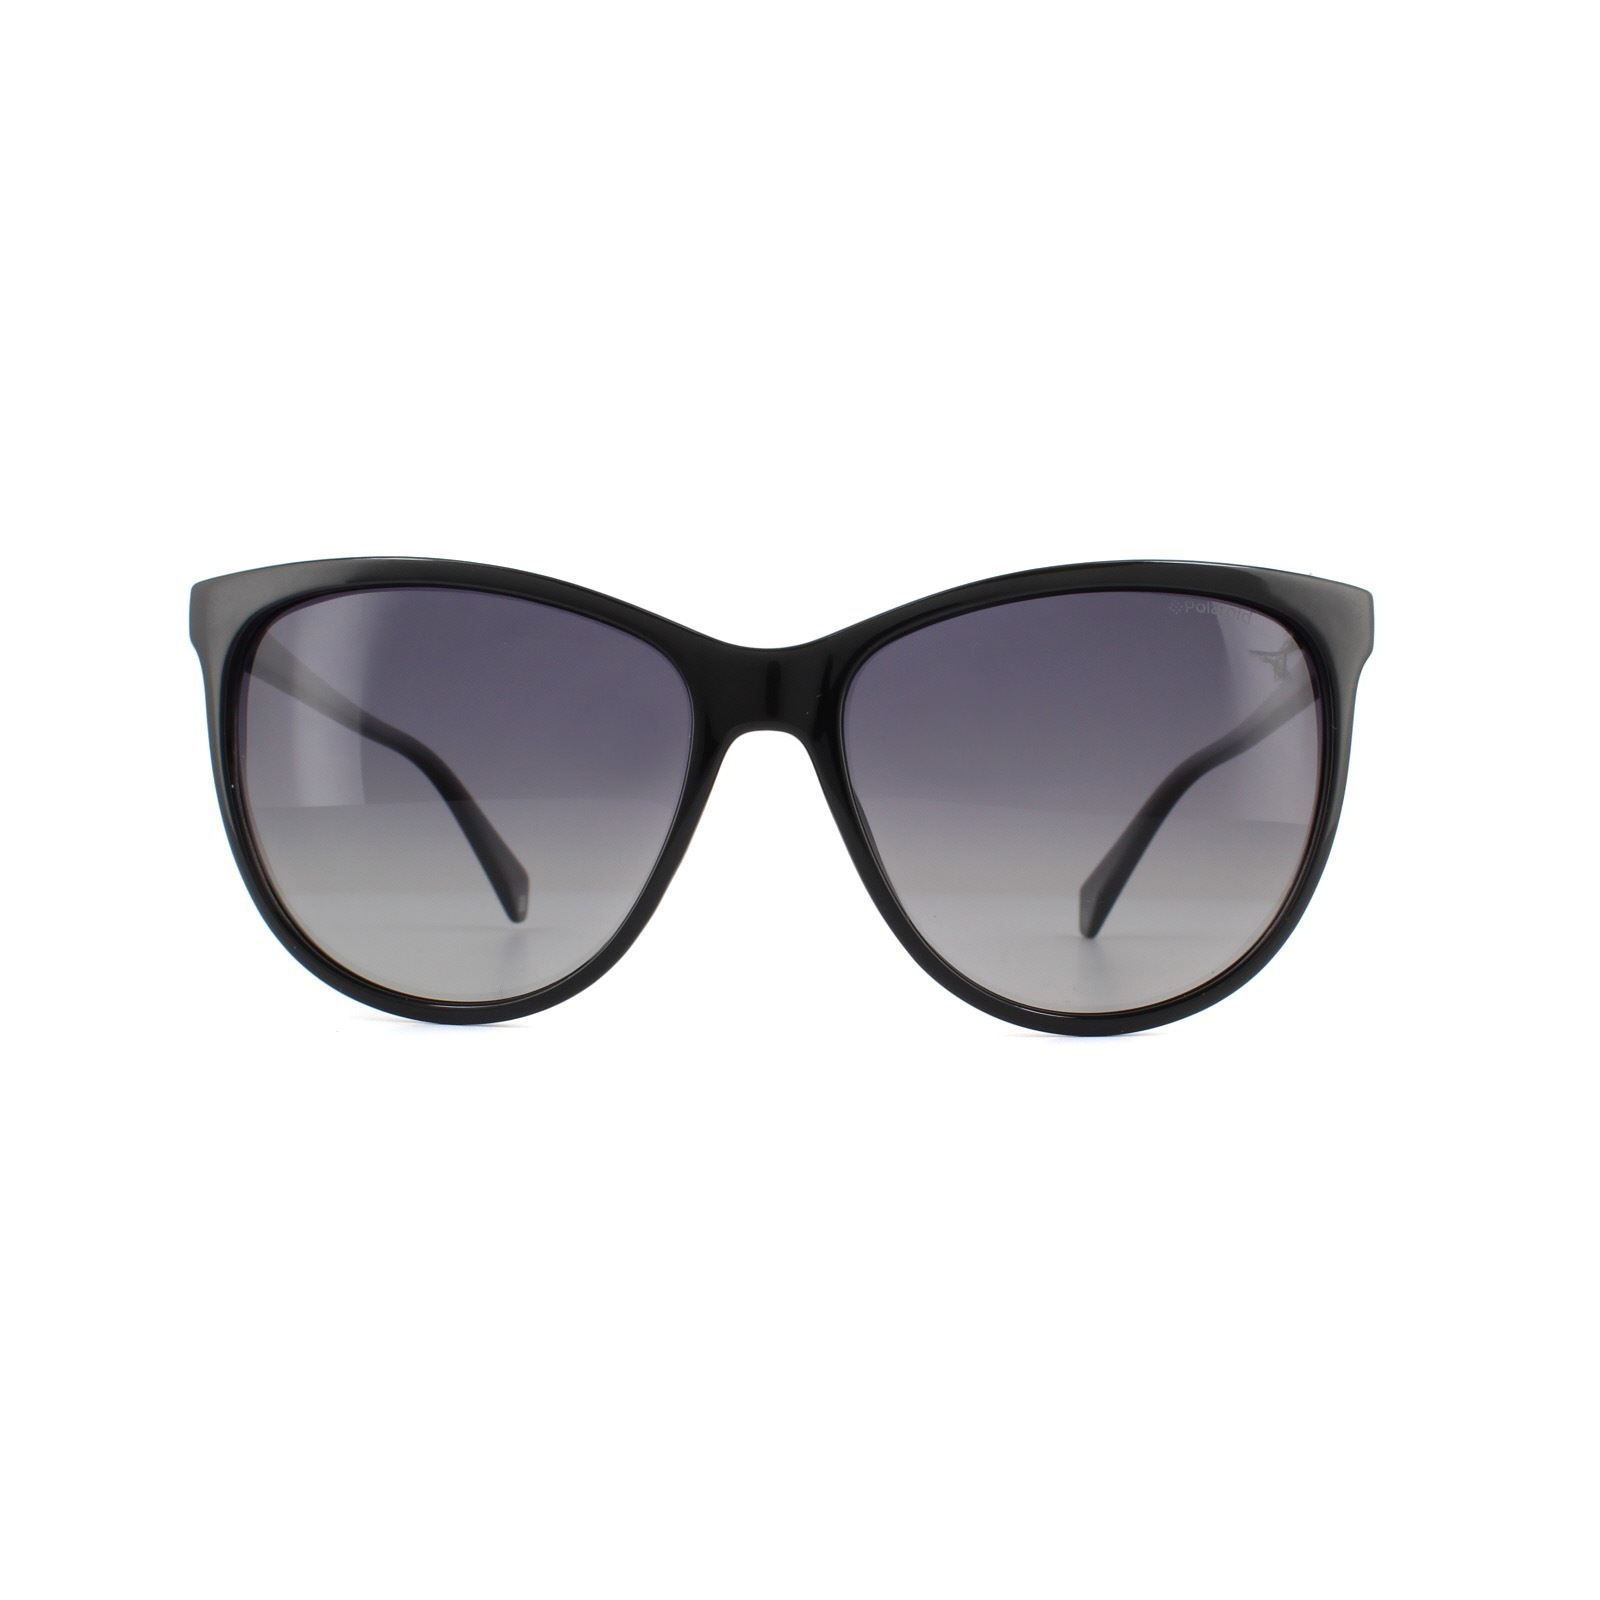 Polaroid Sunglasses PLD 4066/S 807 WJ Black Grey Polarized